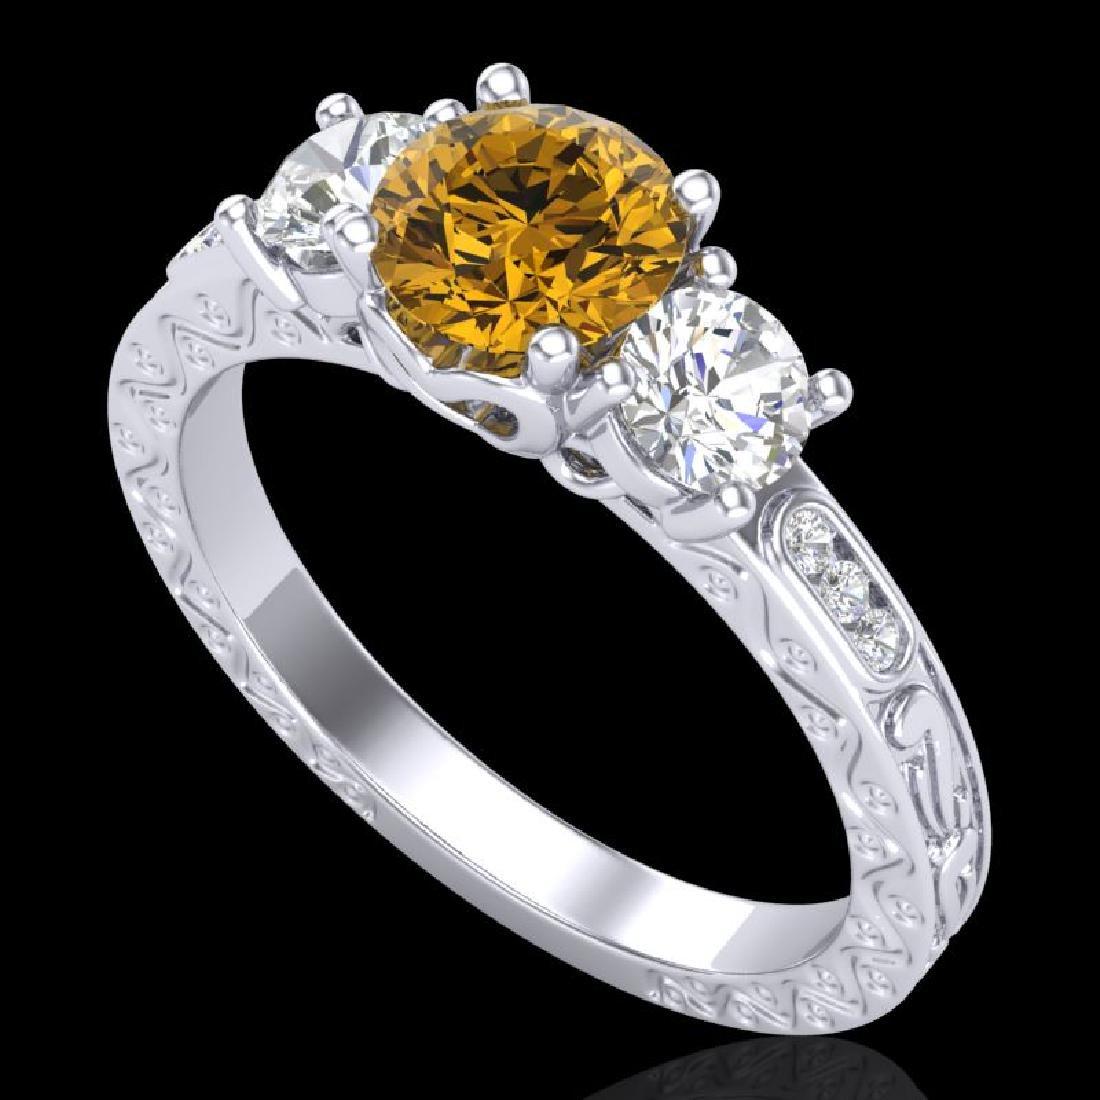 1.41 CTW Intense Fancy Yellow Diamond Art Deco 3 Stone